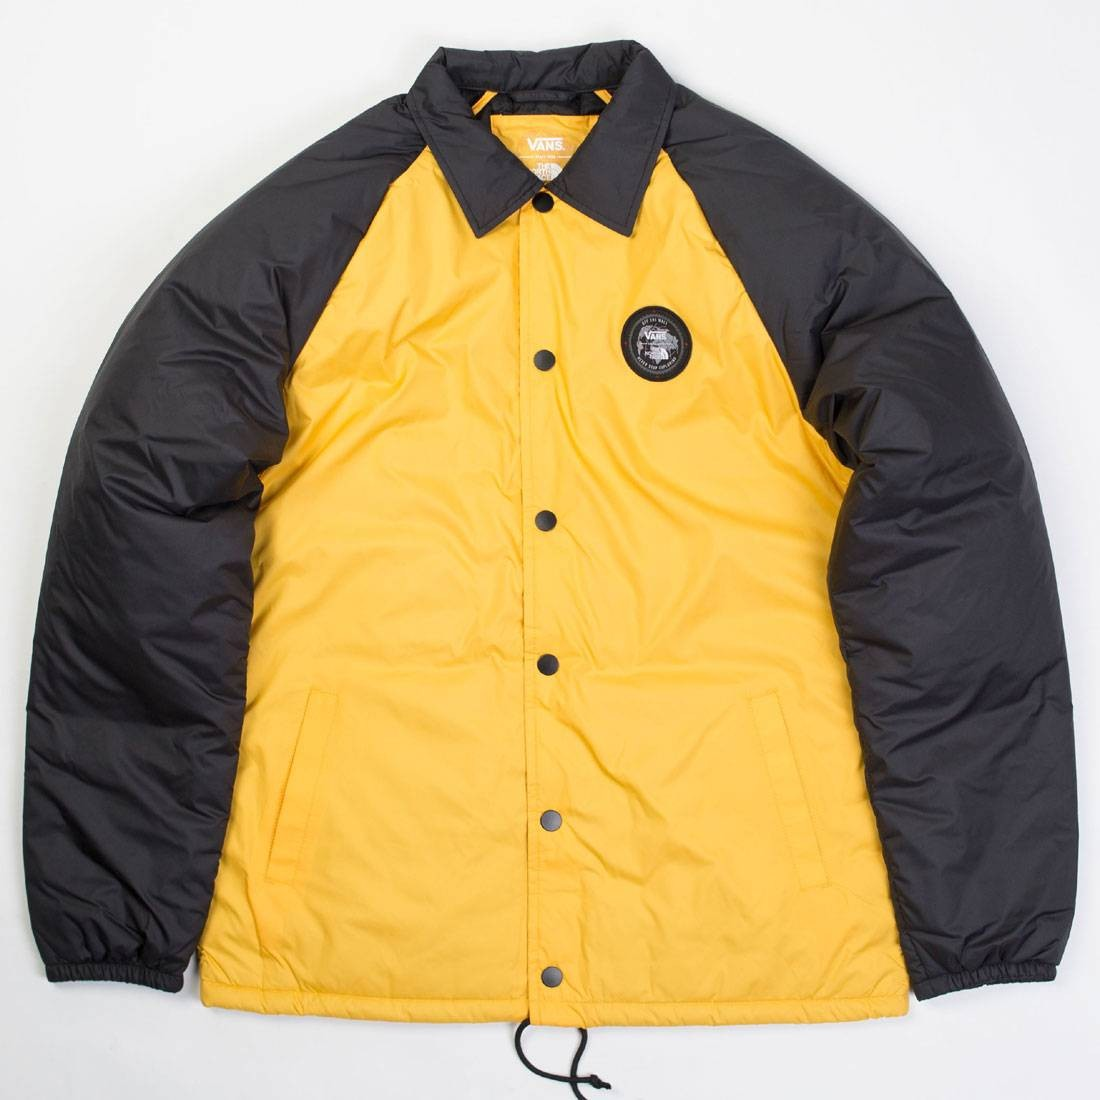 24fd165658 Vans x The North Face Men Torrey Jacket yellow black